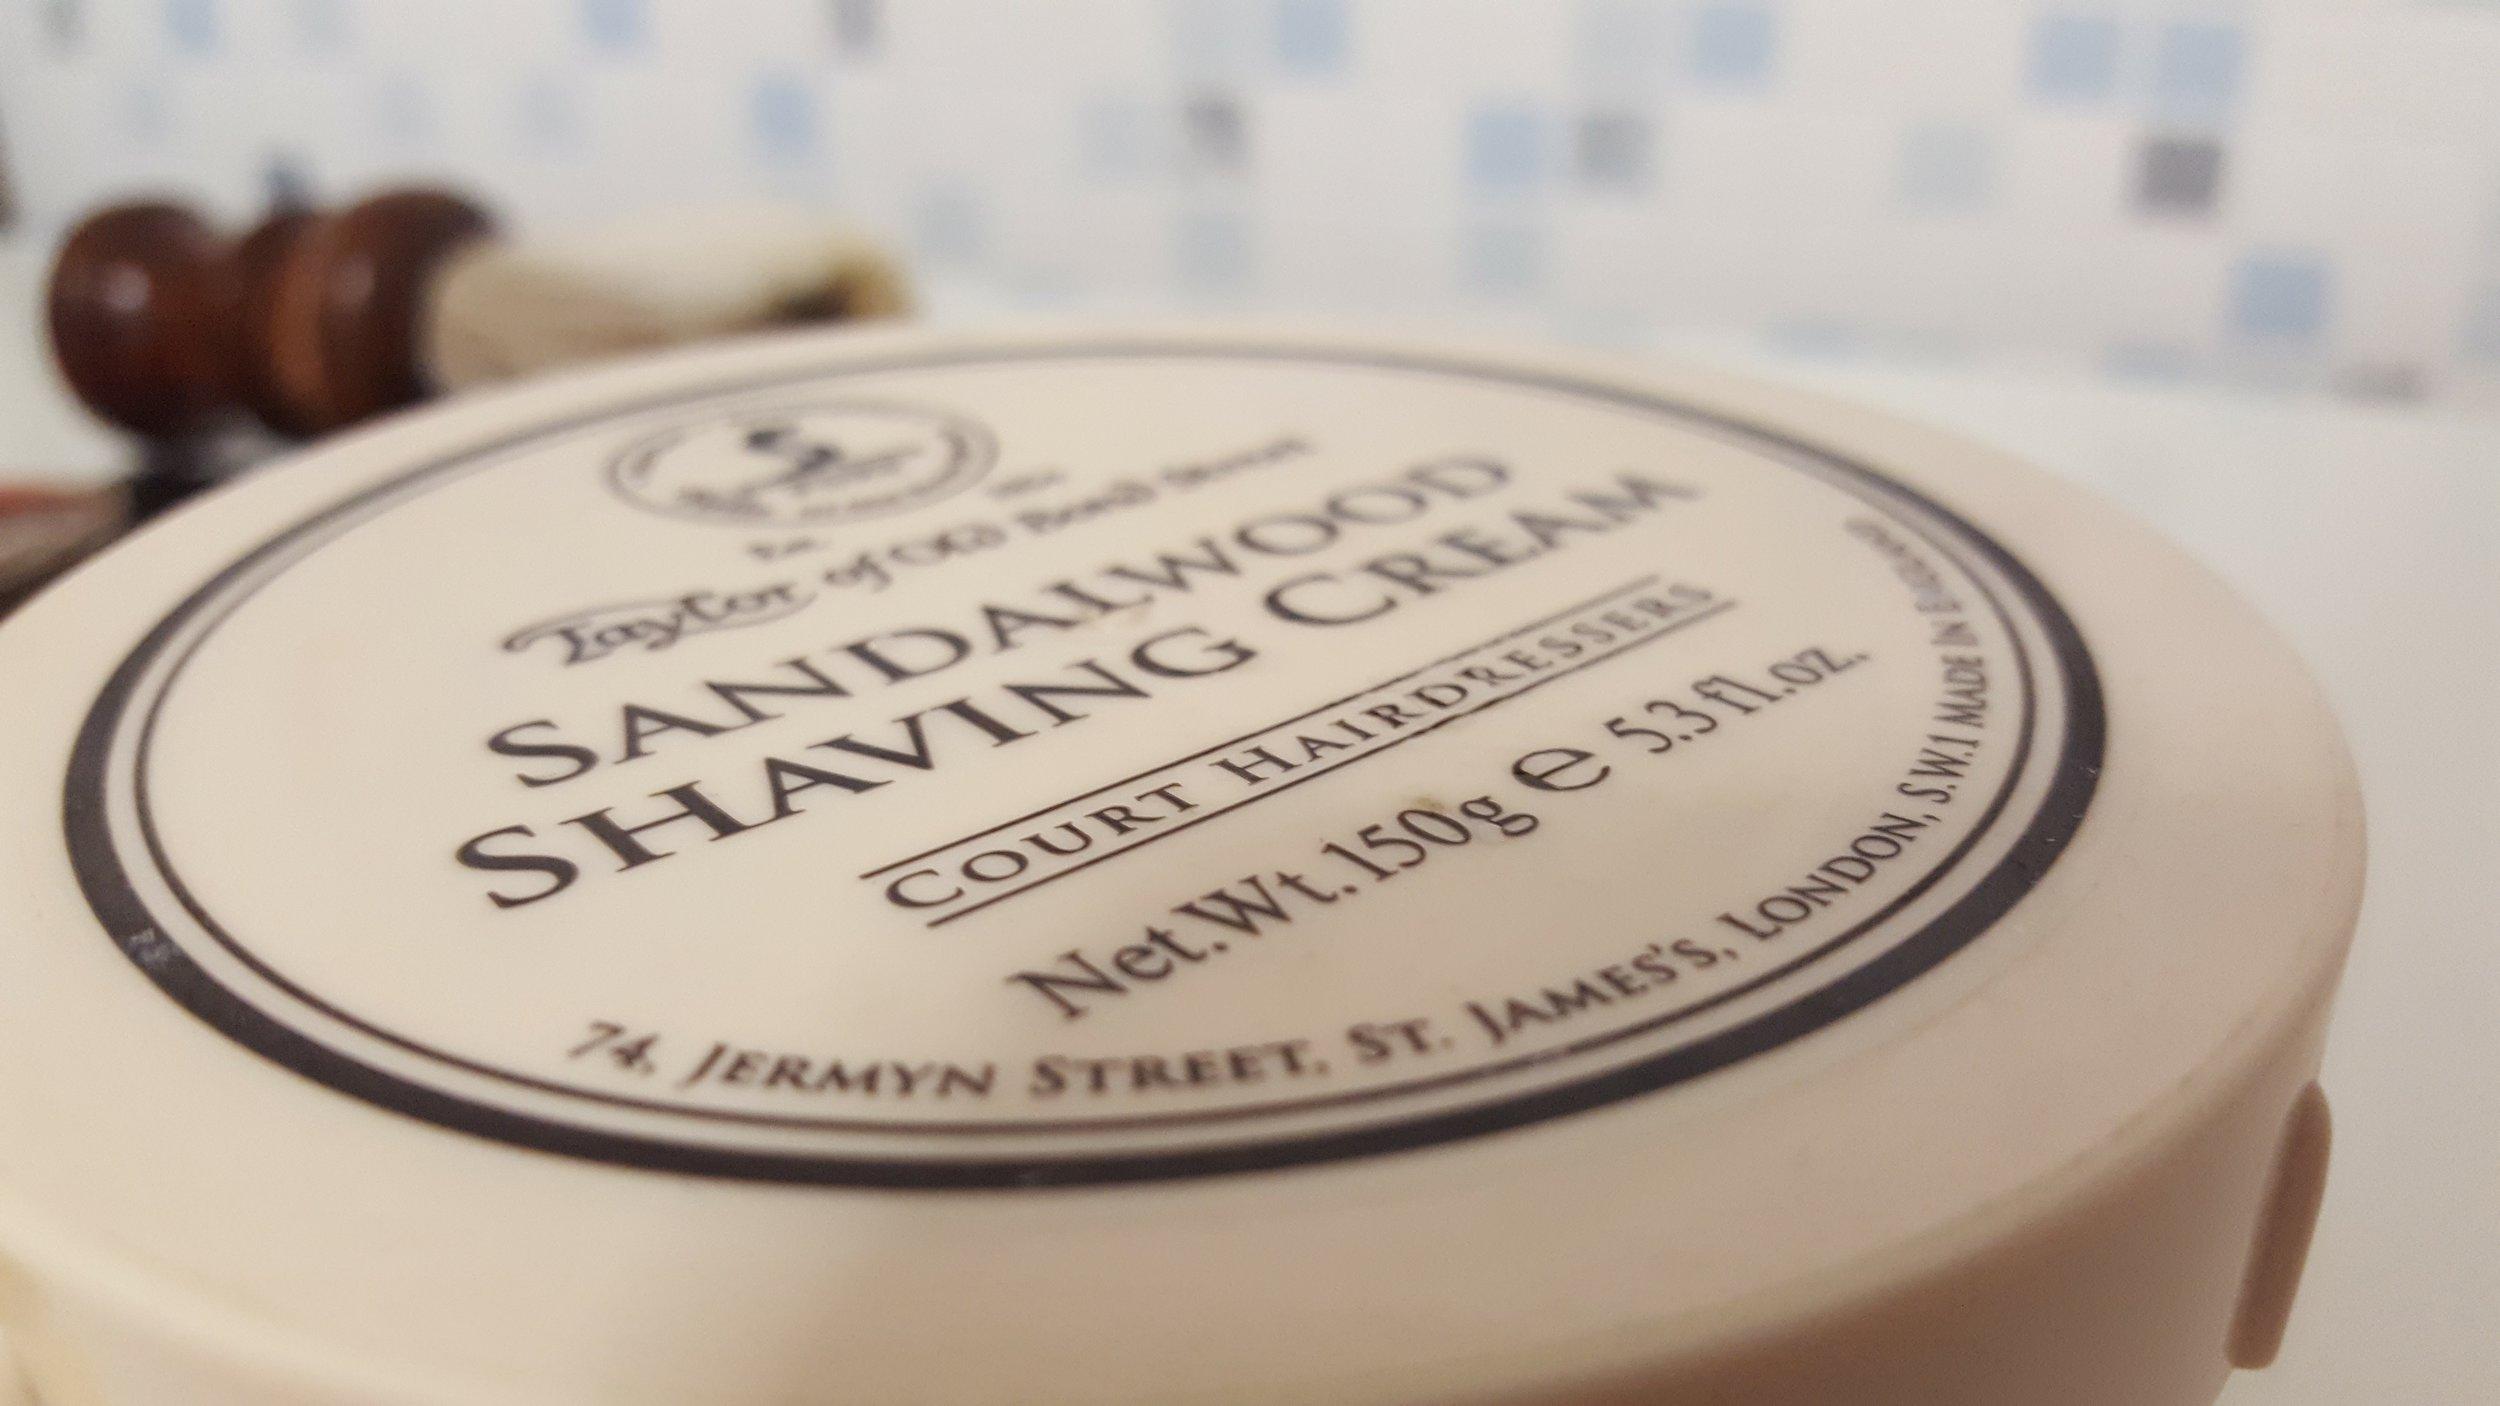 Shaving cream taylor of old bond street